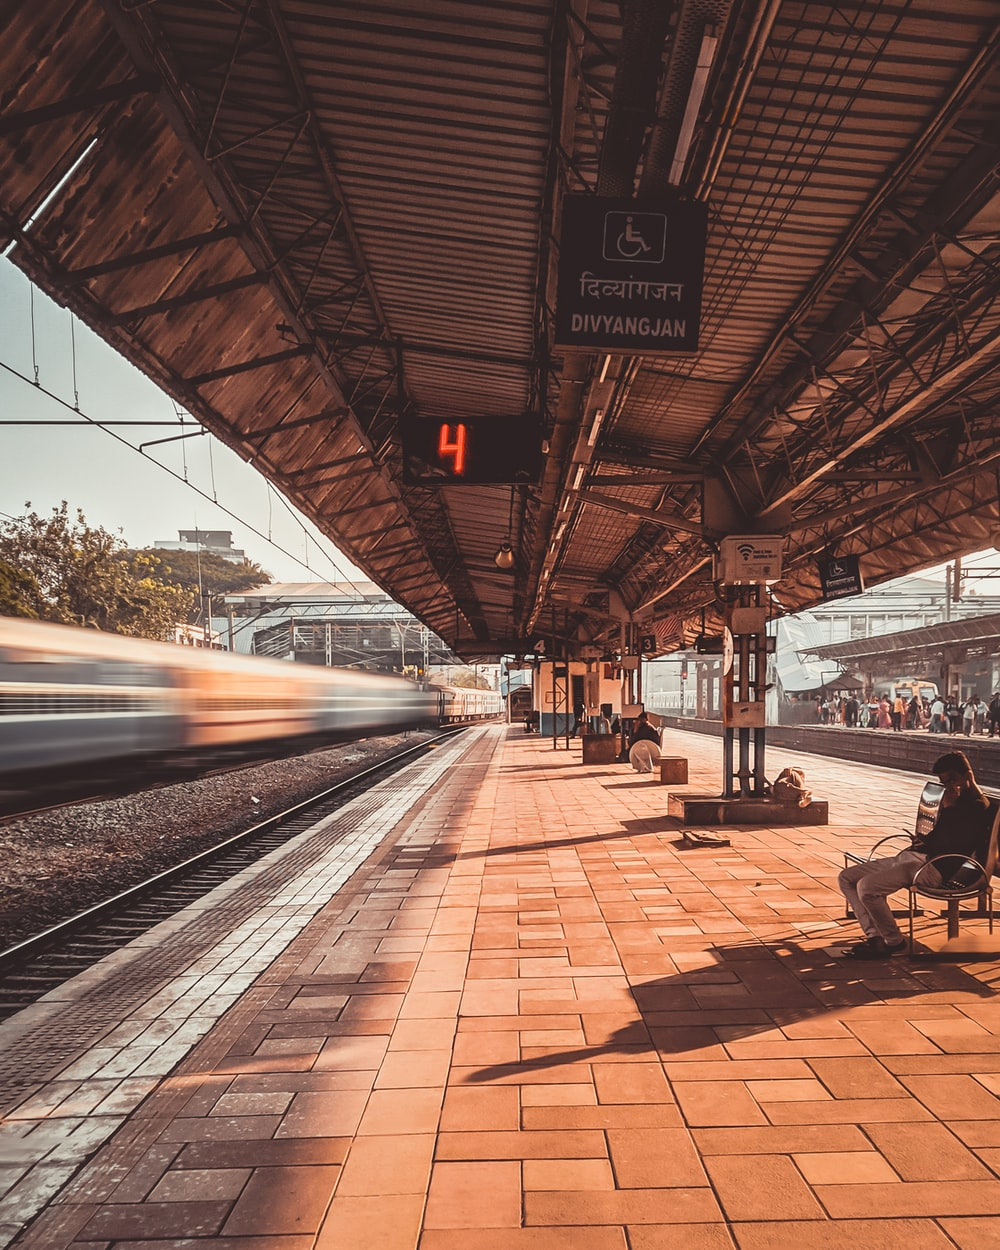 people sitting on bench near train rail during daytime